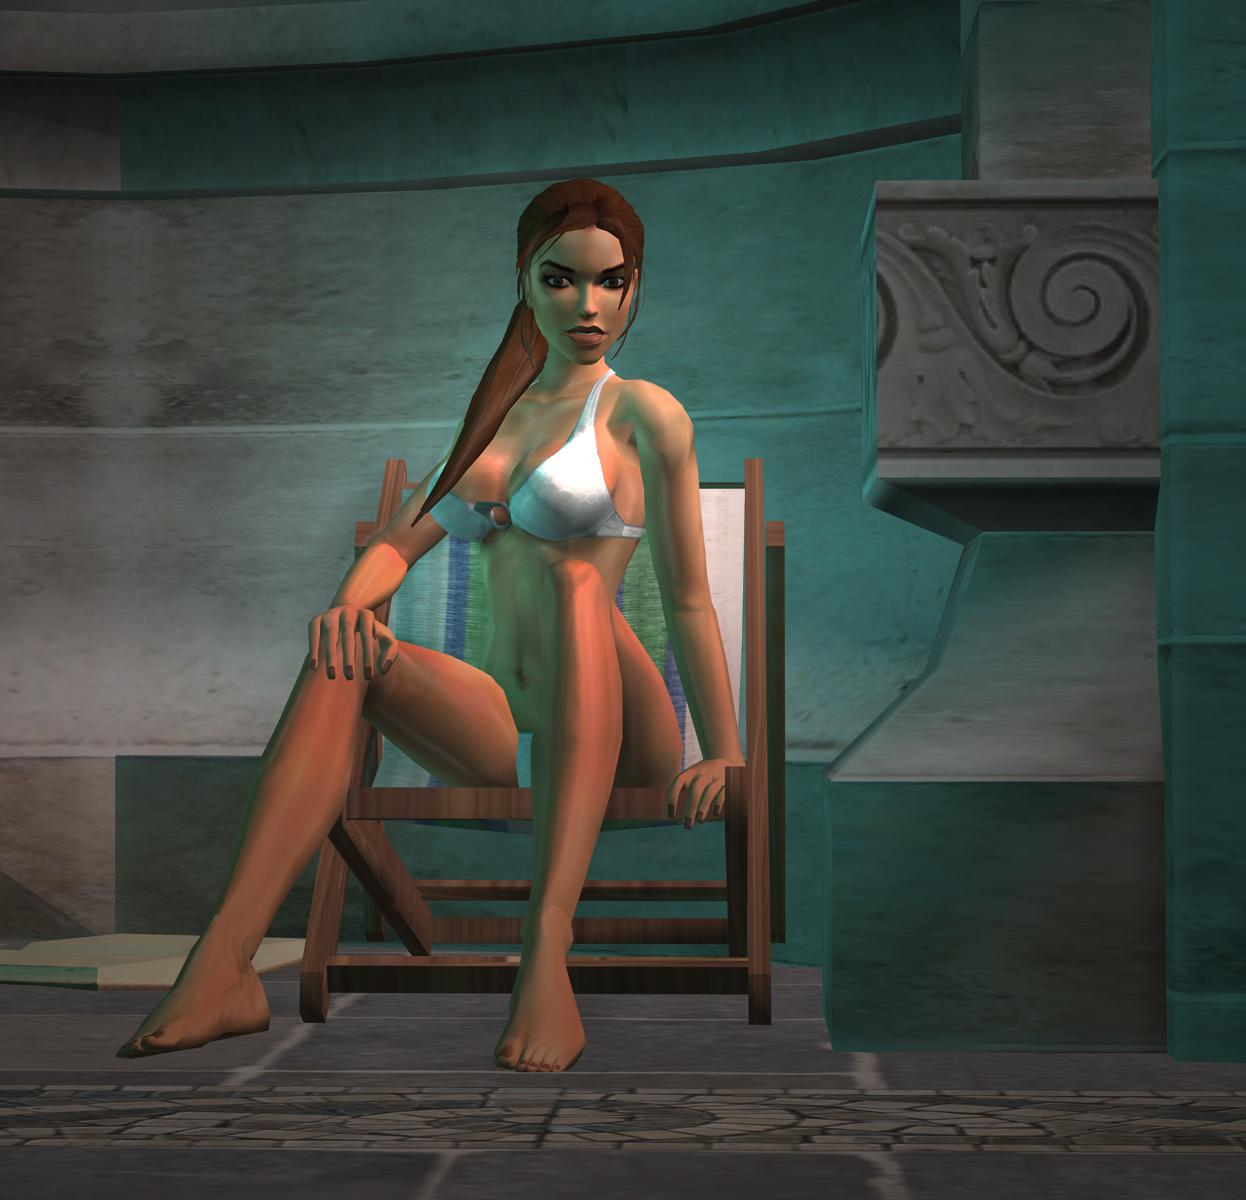 Gamesradar tomb raider mod sexy video